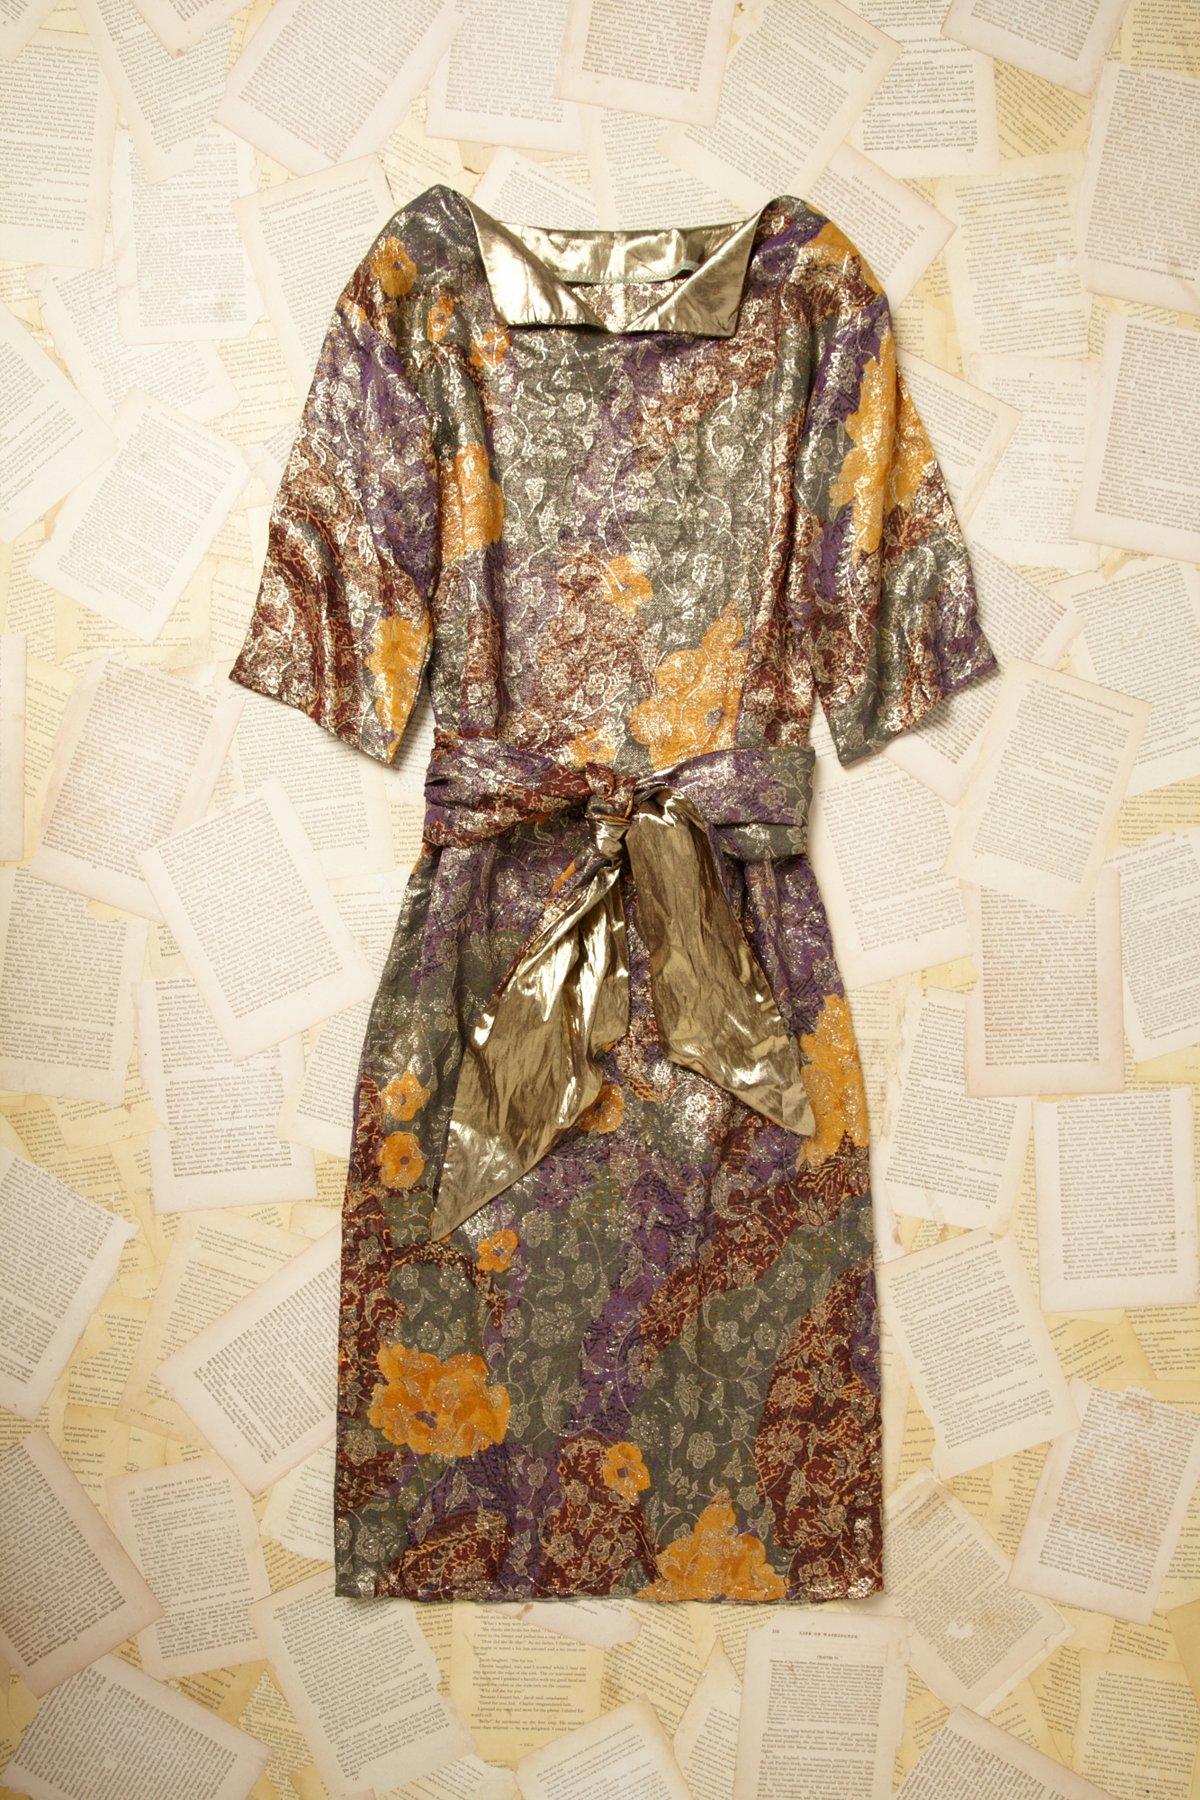 Vintage 1960s Metallic Jacquard Print Dress